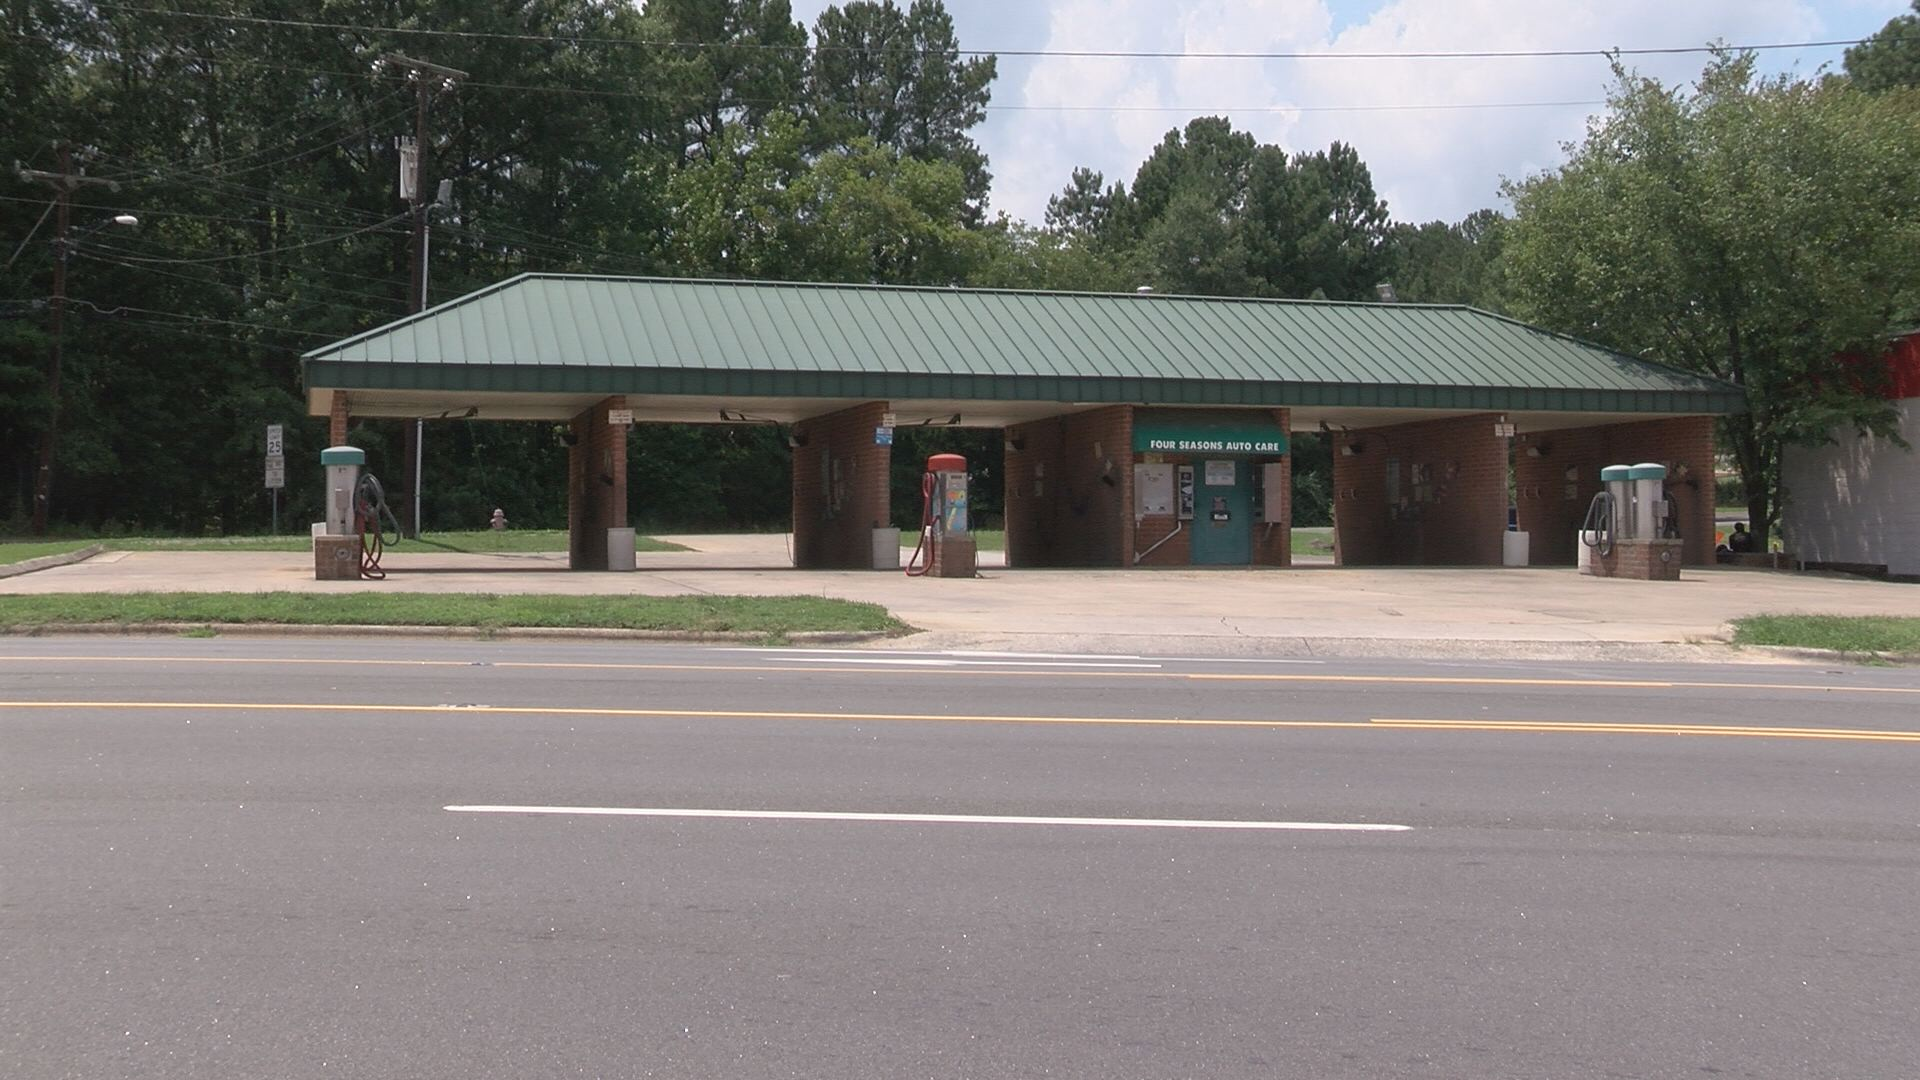 Cooper seeks $3 9B bond package, 9 percent teacher raises